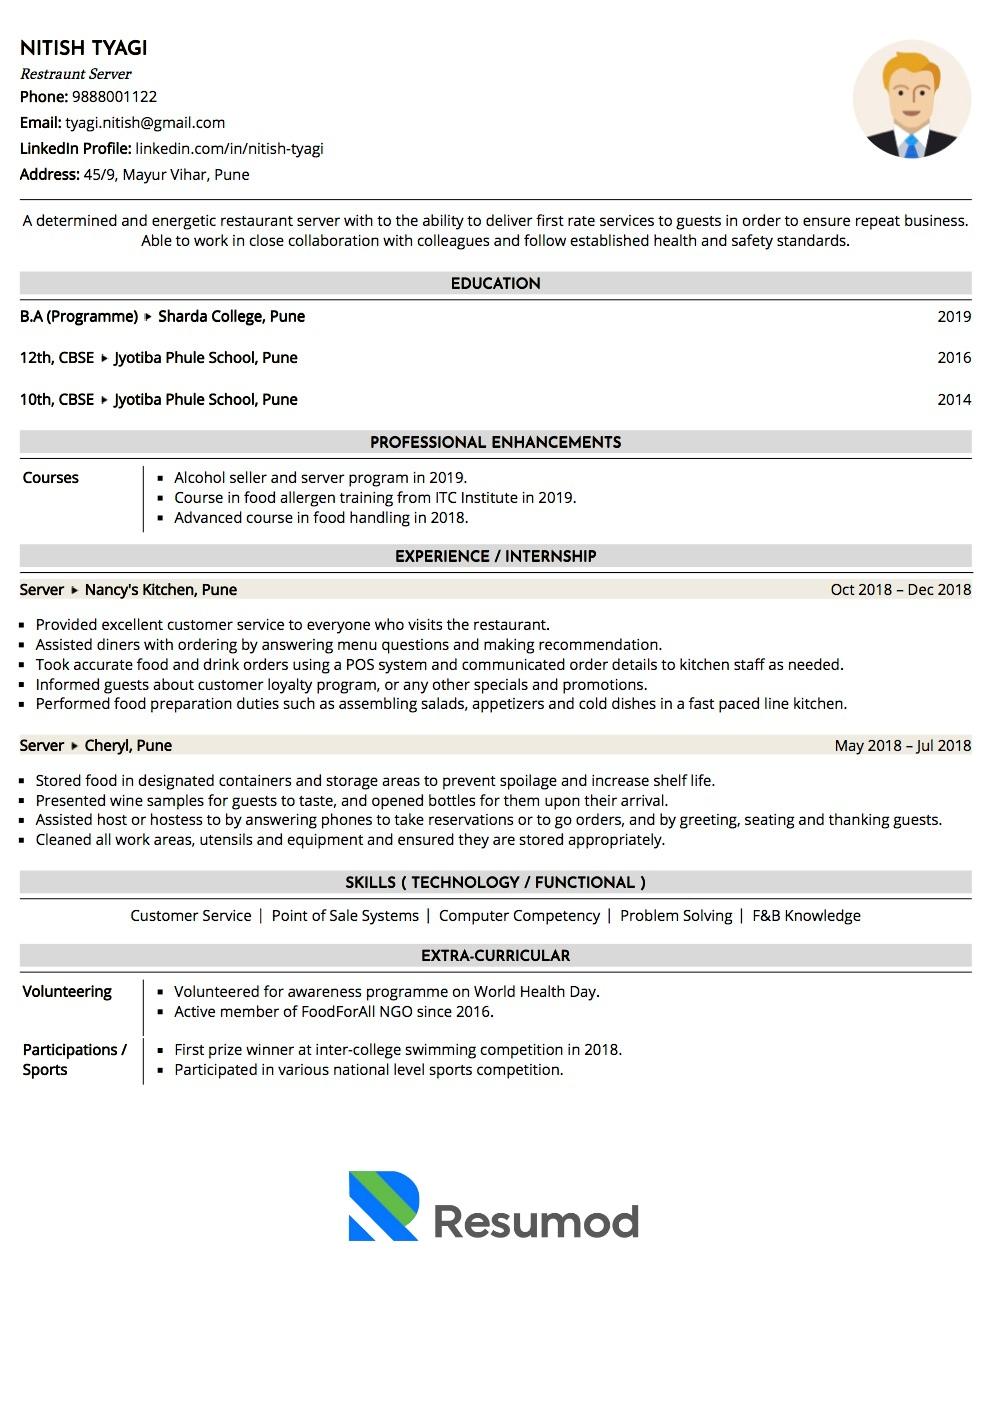 Resume Of Server